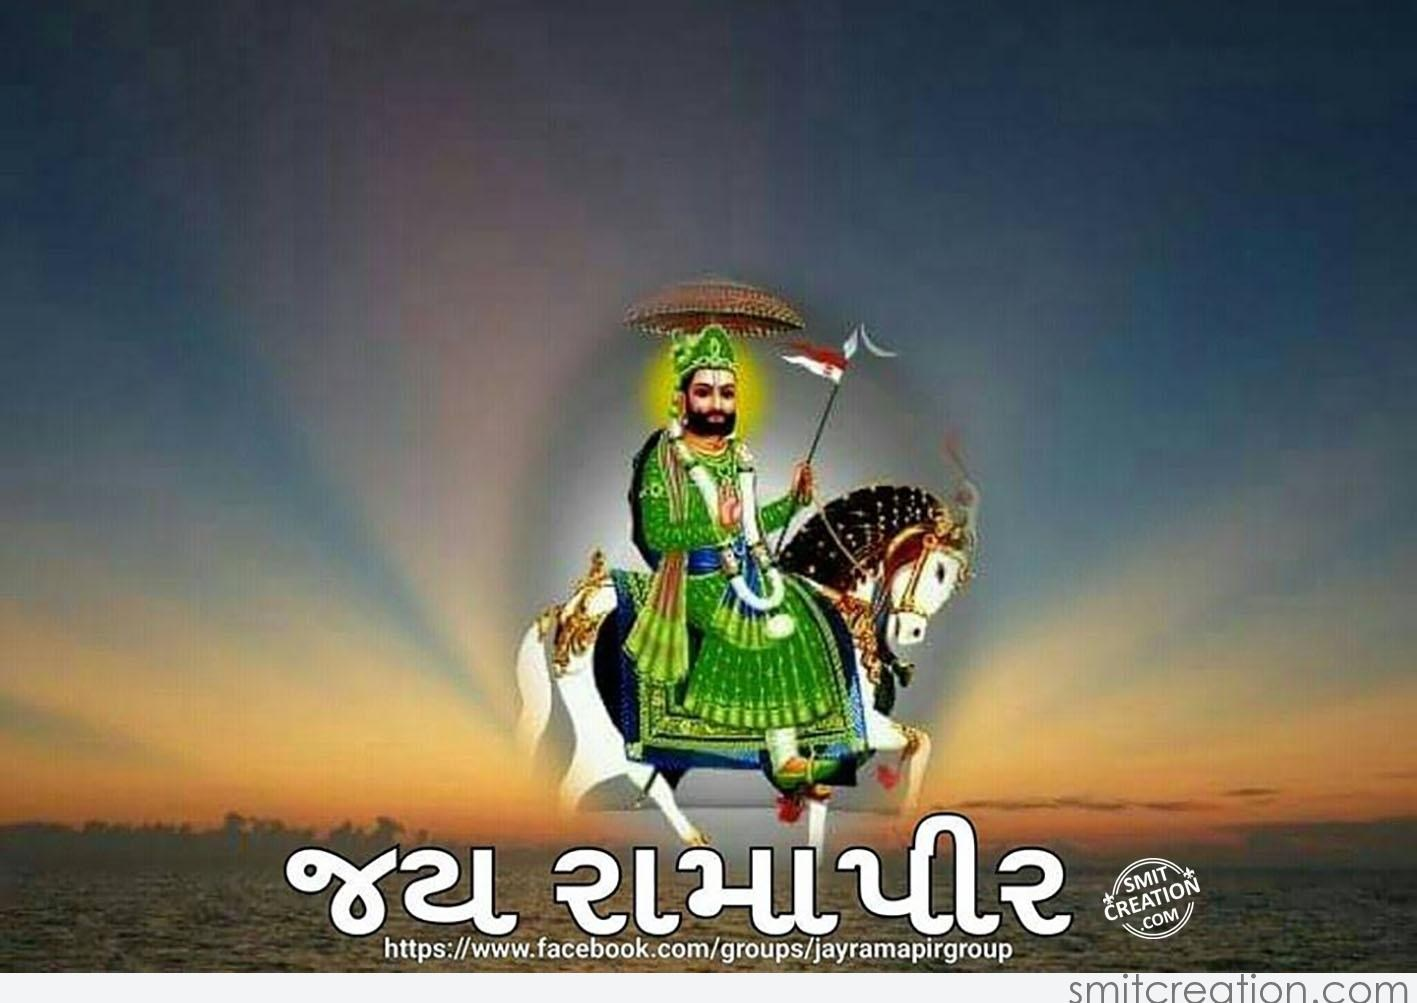 God Ganesh Hd Wallpaper Jai Ramapir Smitcreation Com